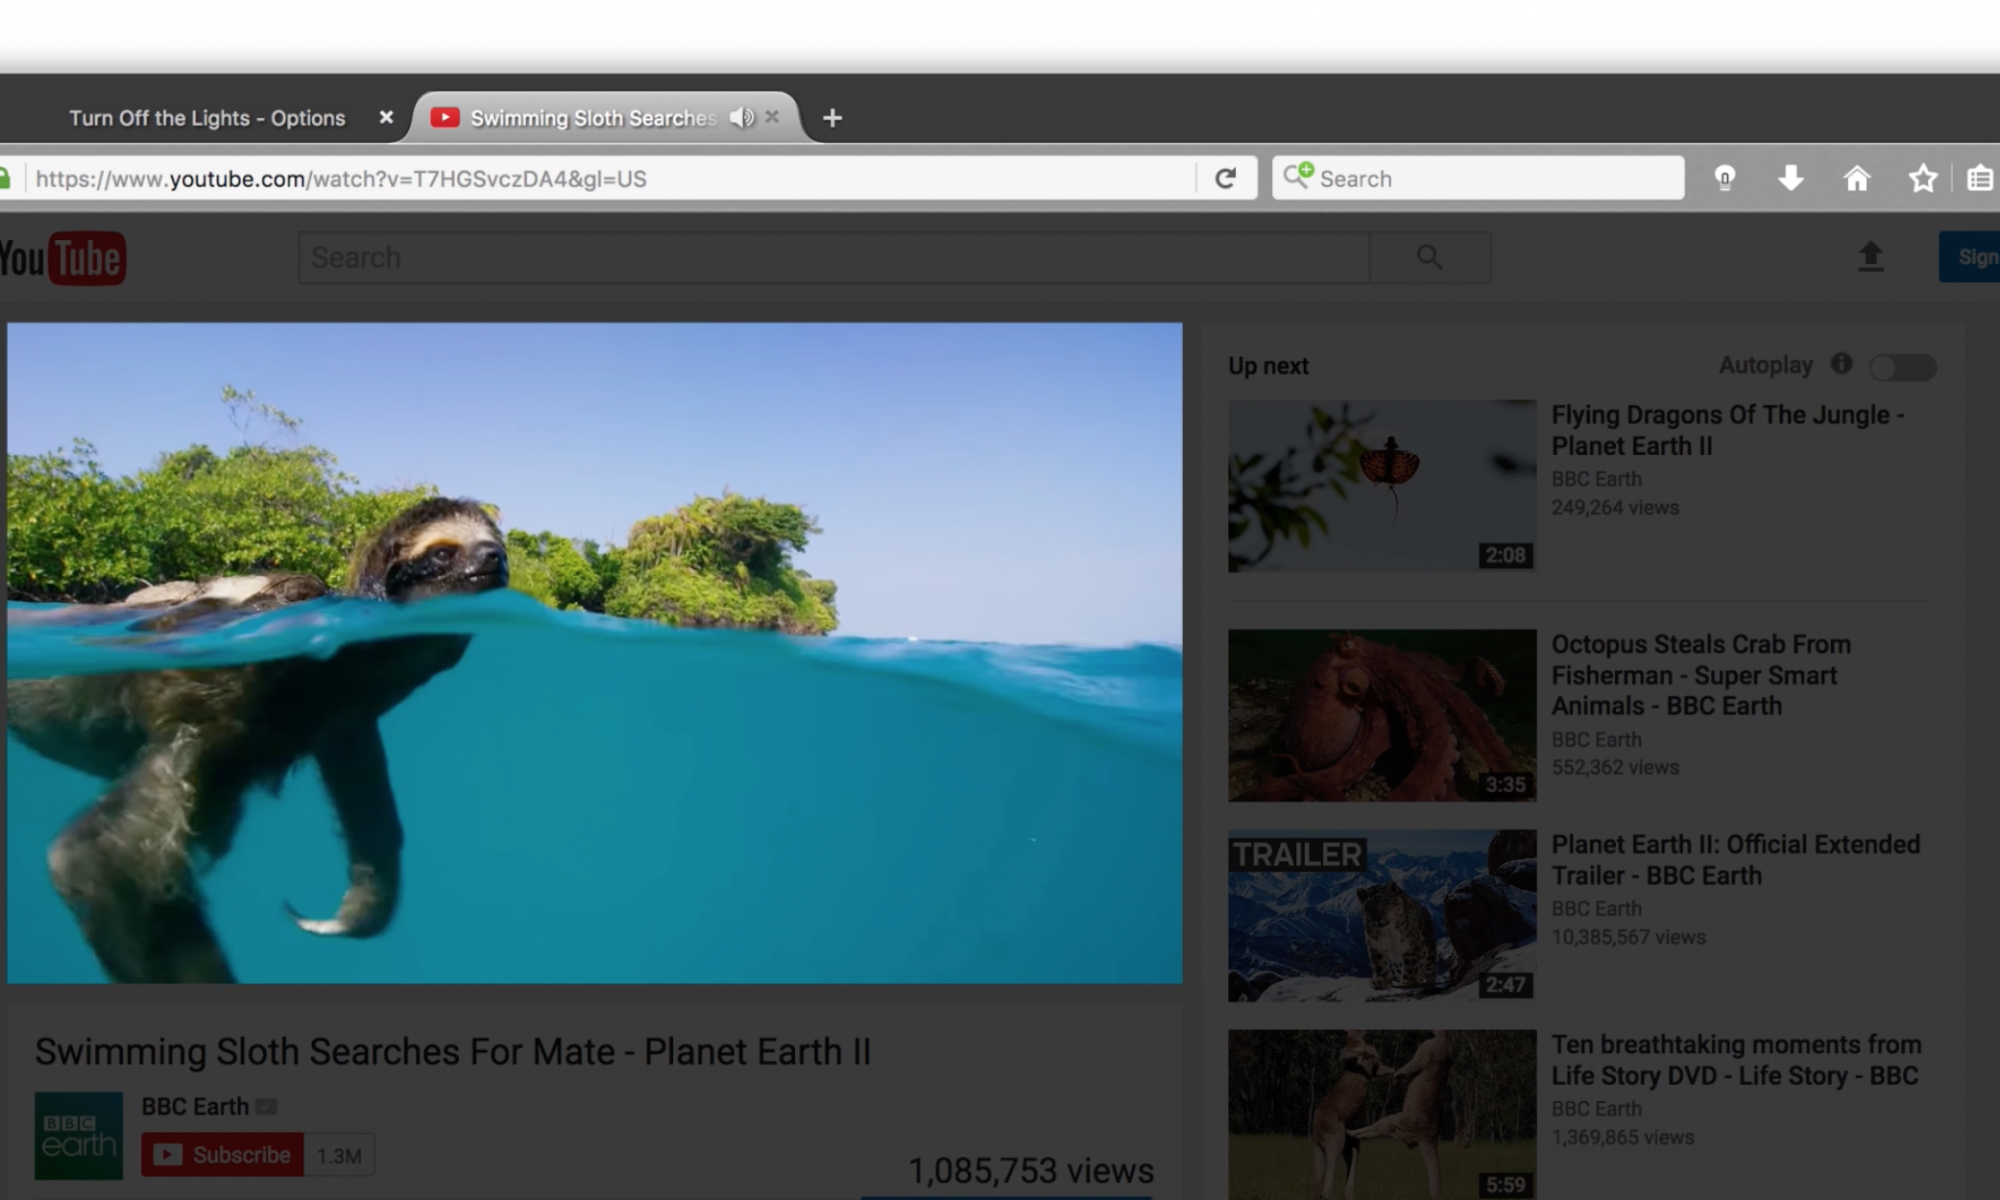 Firefox Dark Theme in toolbar